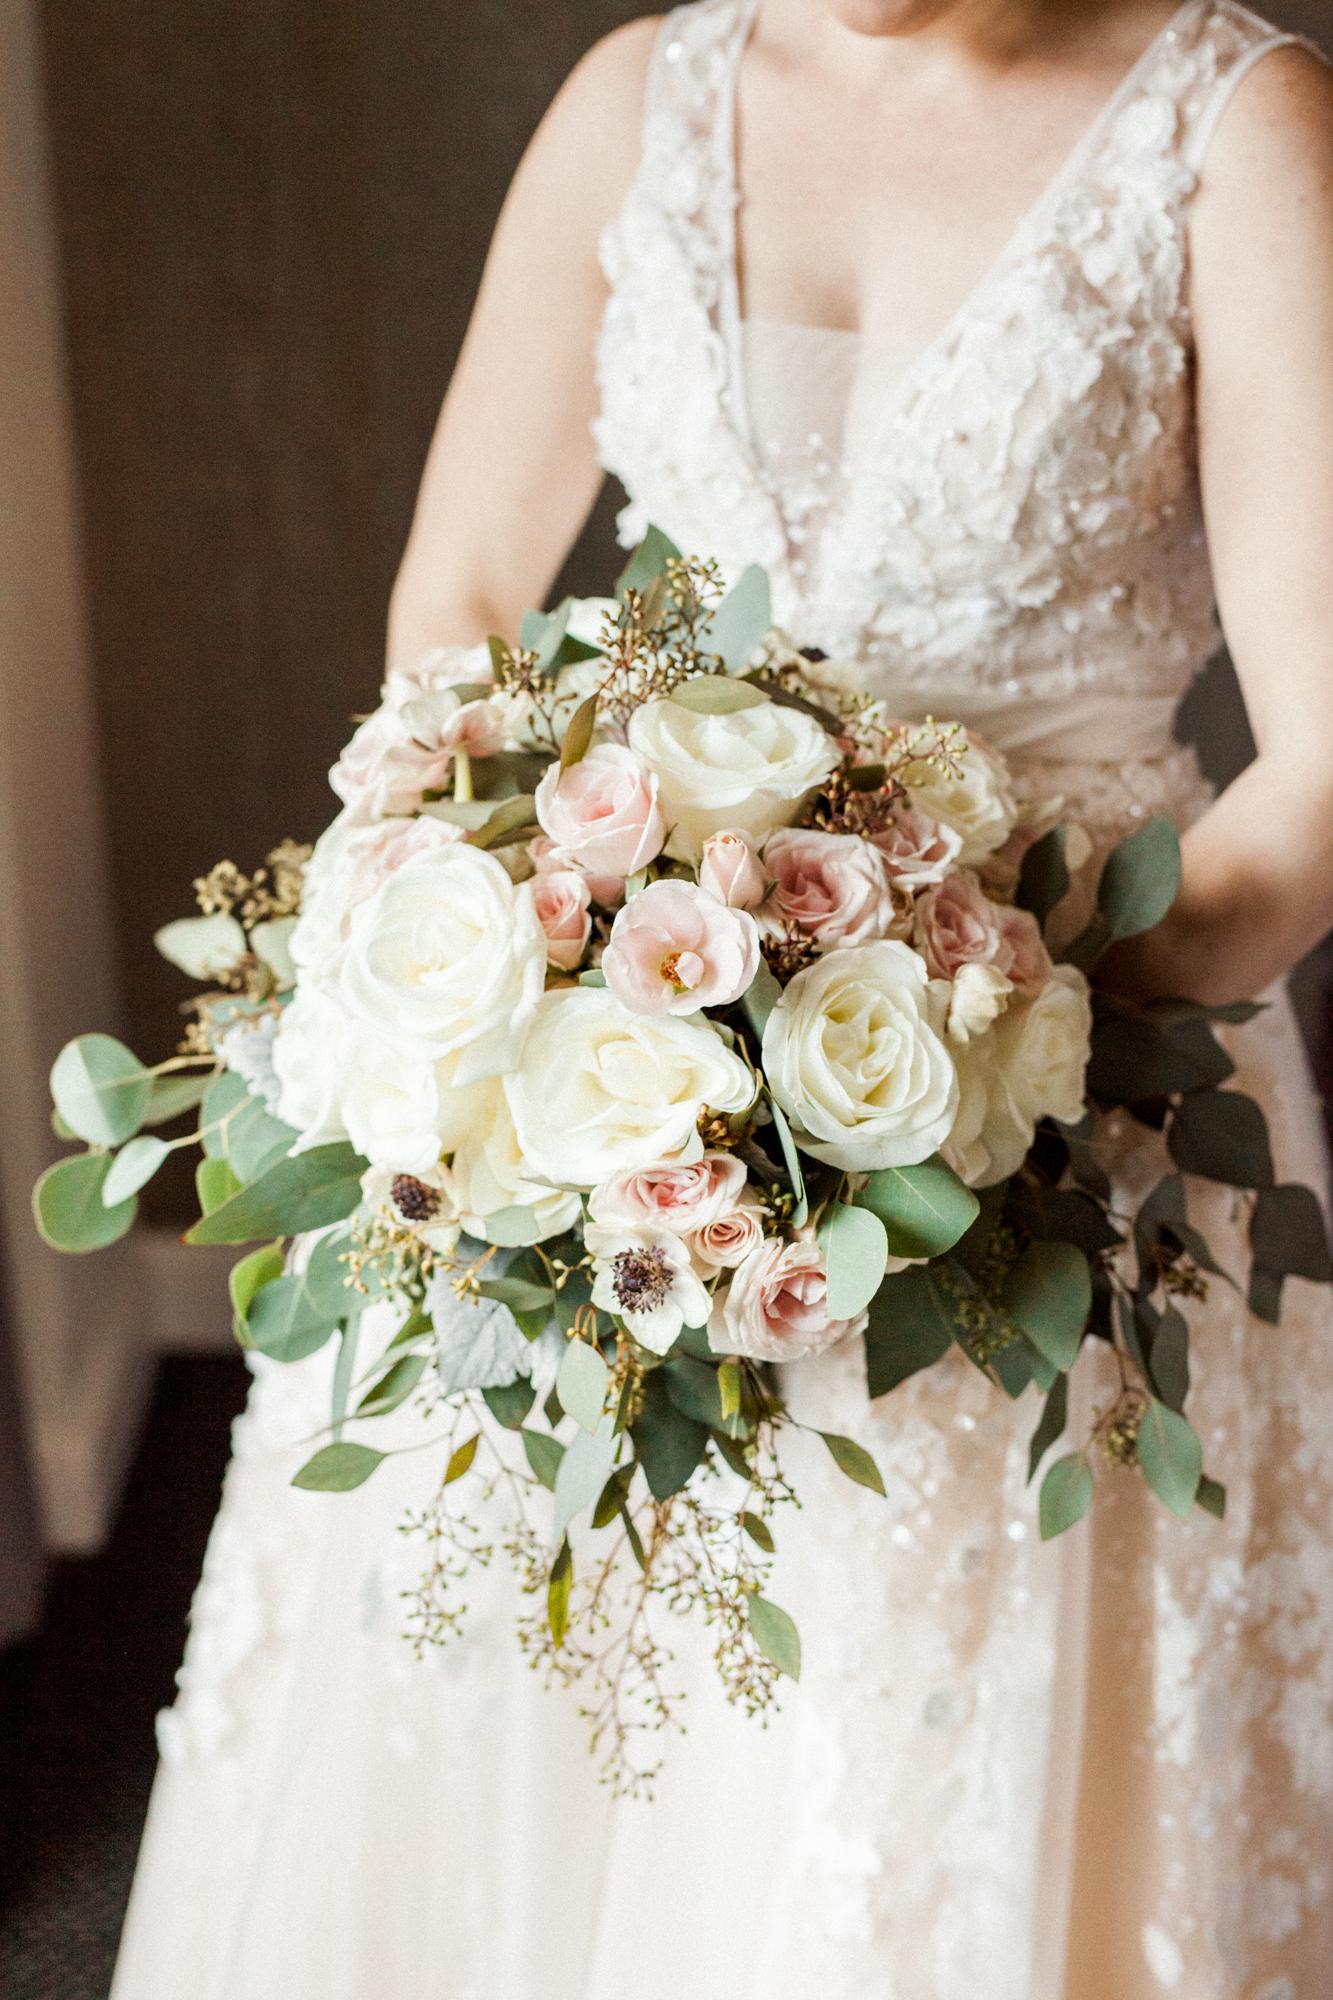 haley-richter-photography-autumn-college-of-physicians-wedding-philadelphia--036.jpg